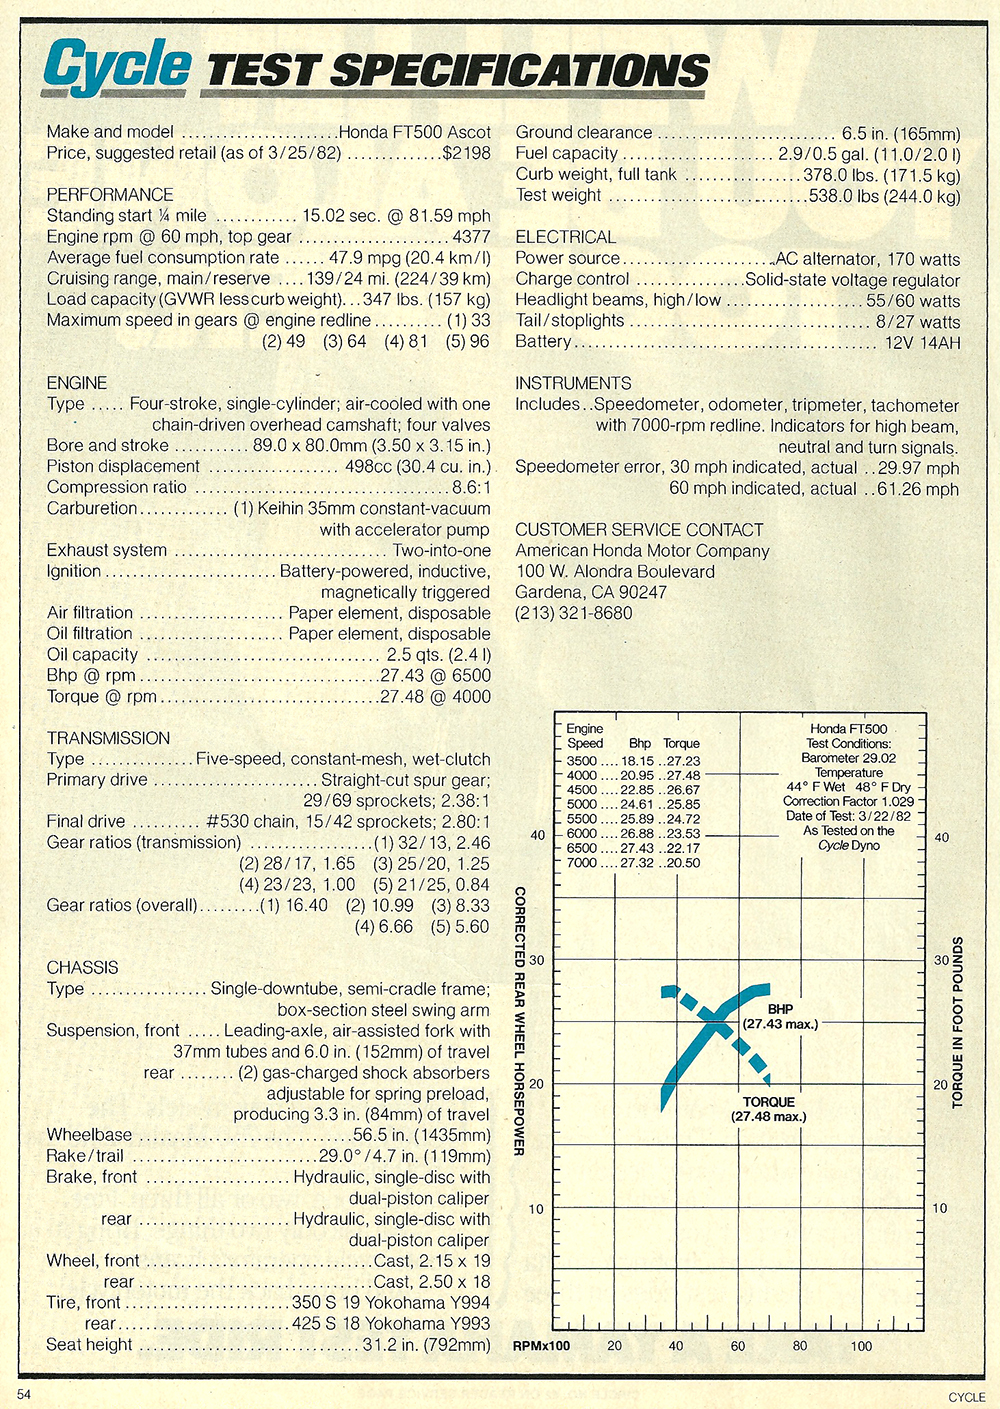 1982 Honda FT500 Ascot road test 2 07.jpg